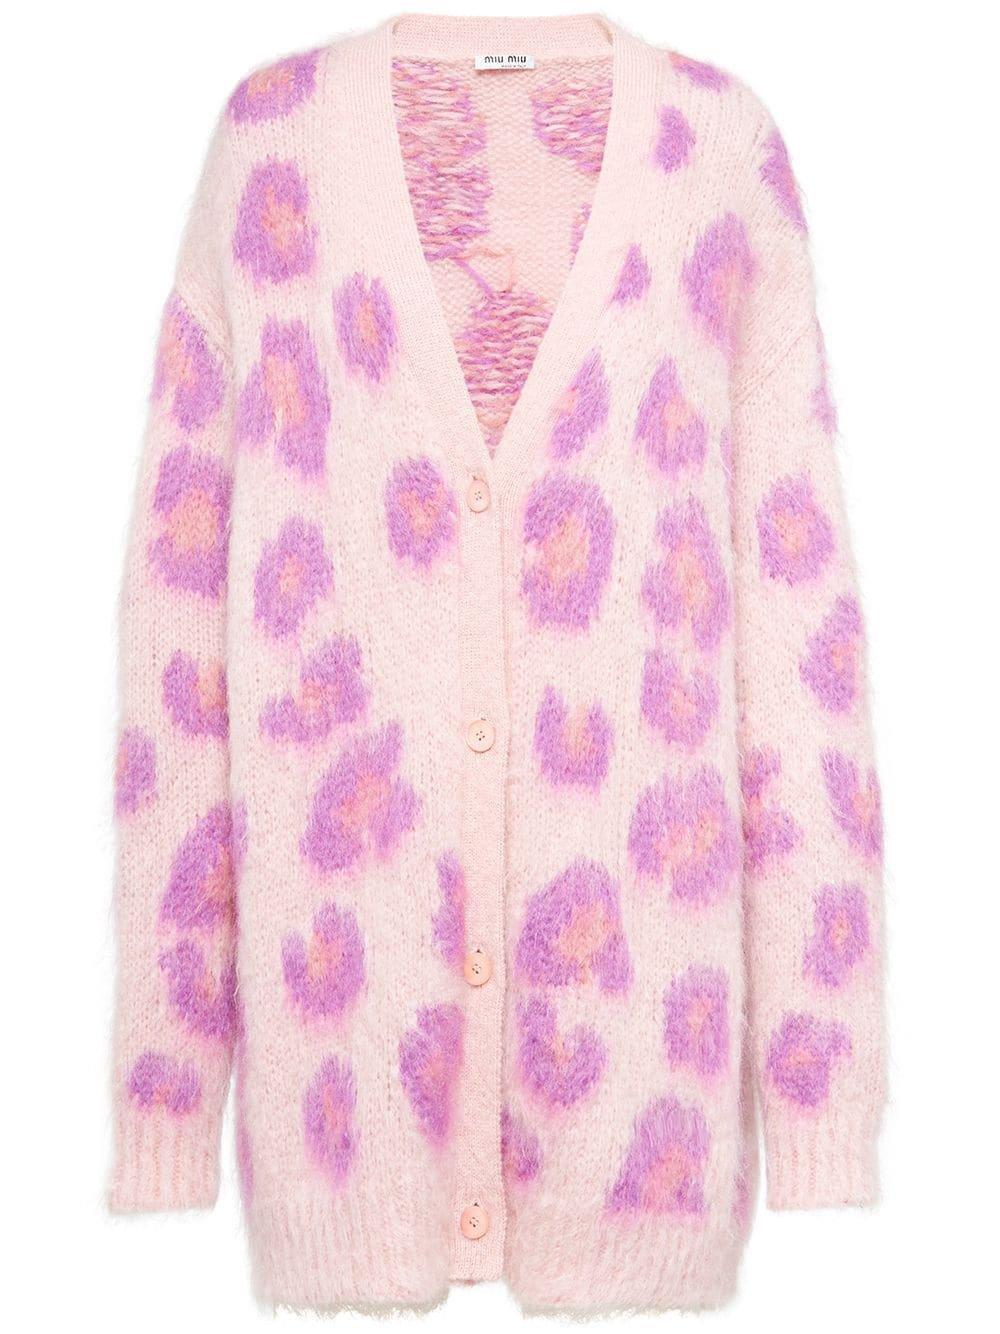 Miu Miu Leopard Oversized Cardigan